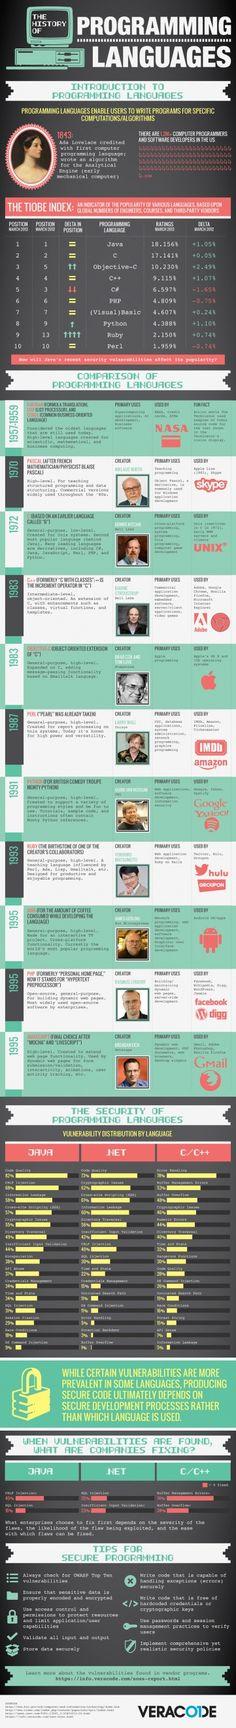 #Infographic: Programming language history